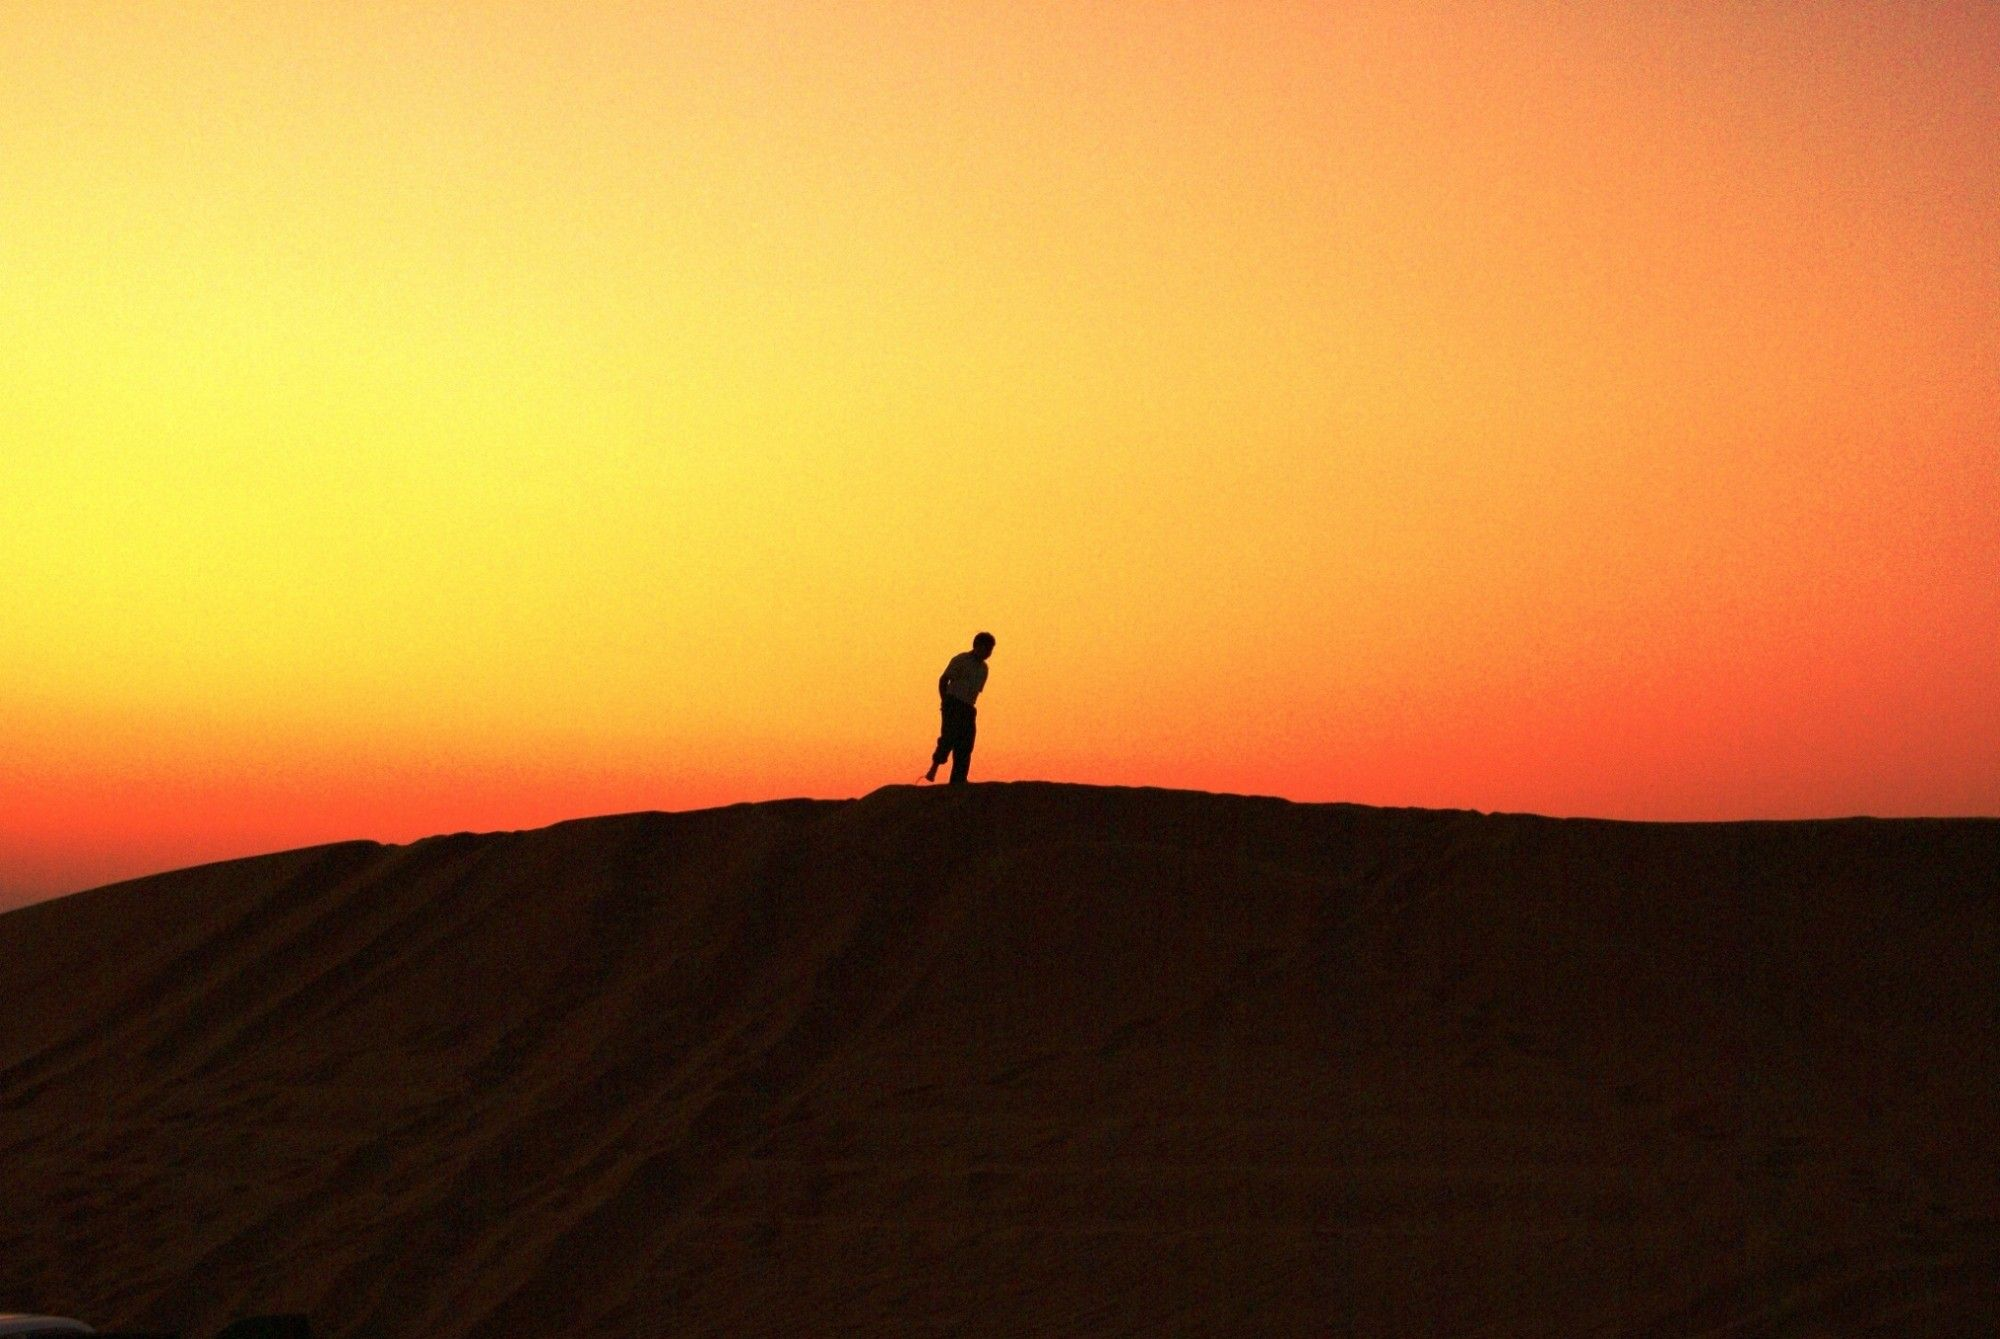 Земле грозит небывалая засуха